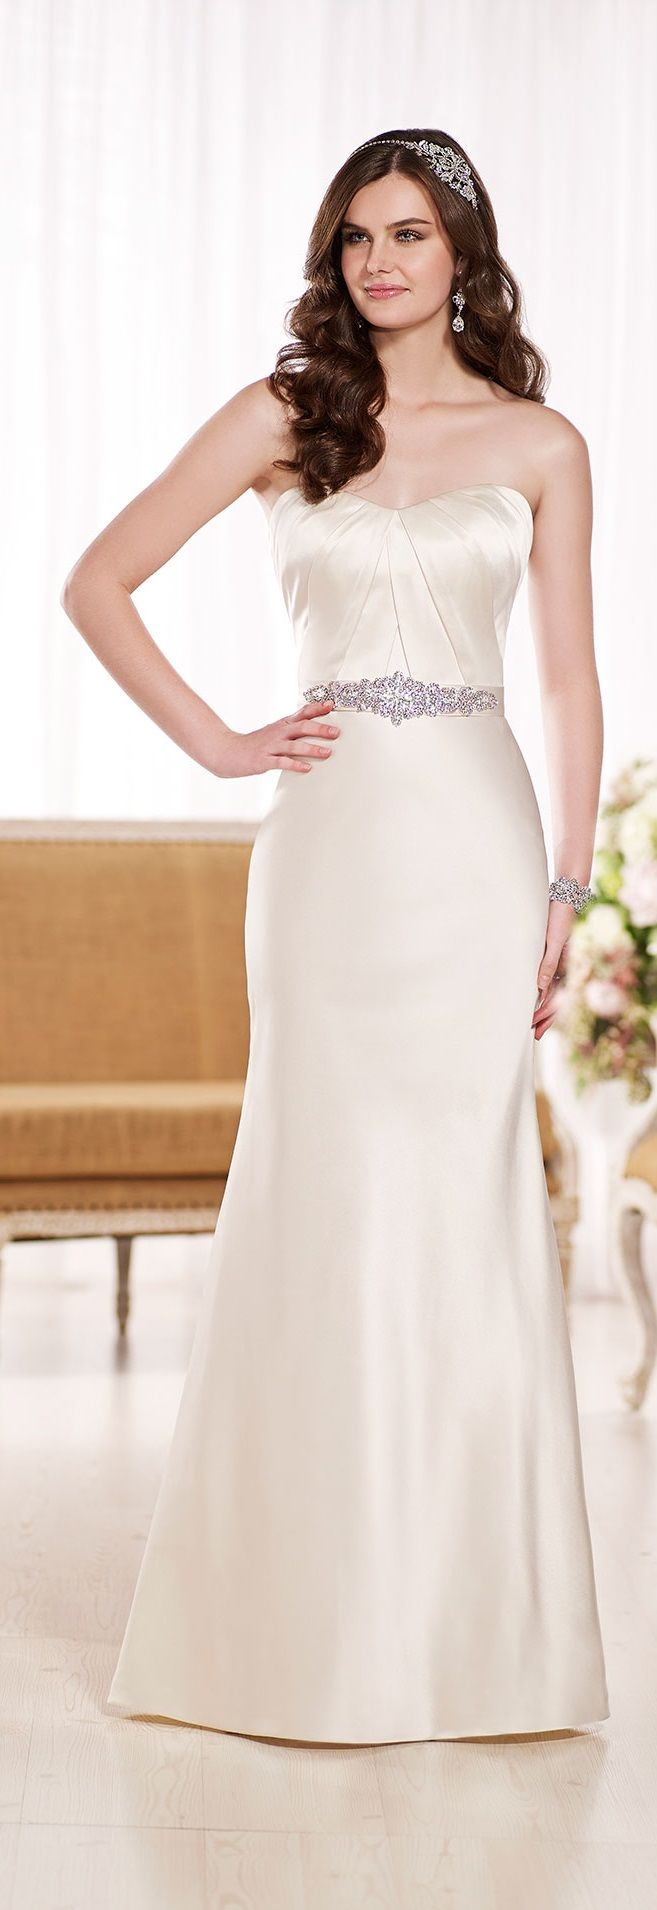 wedding dress from Essense of Australia